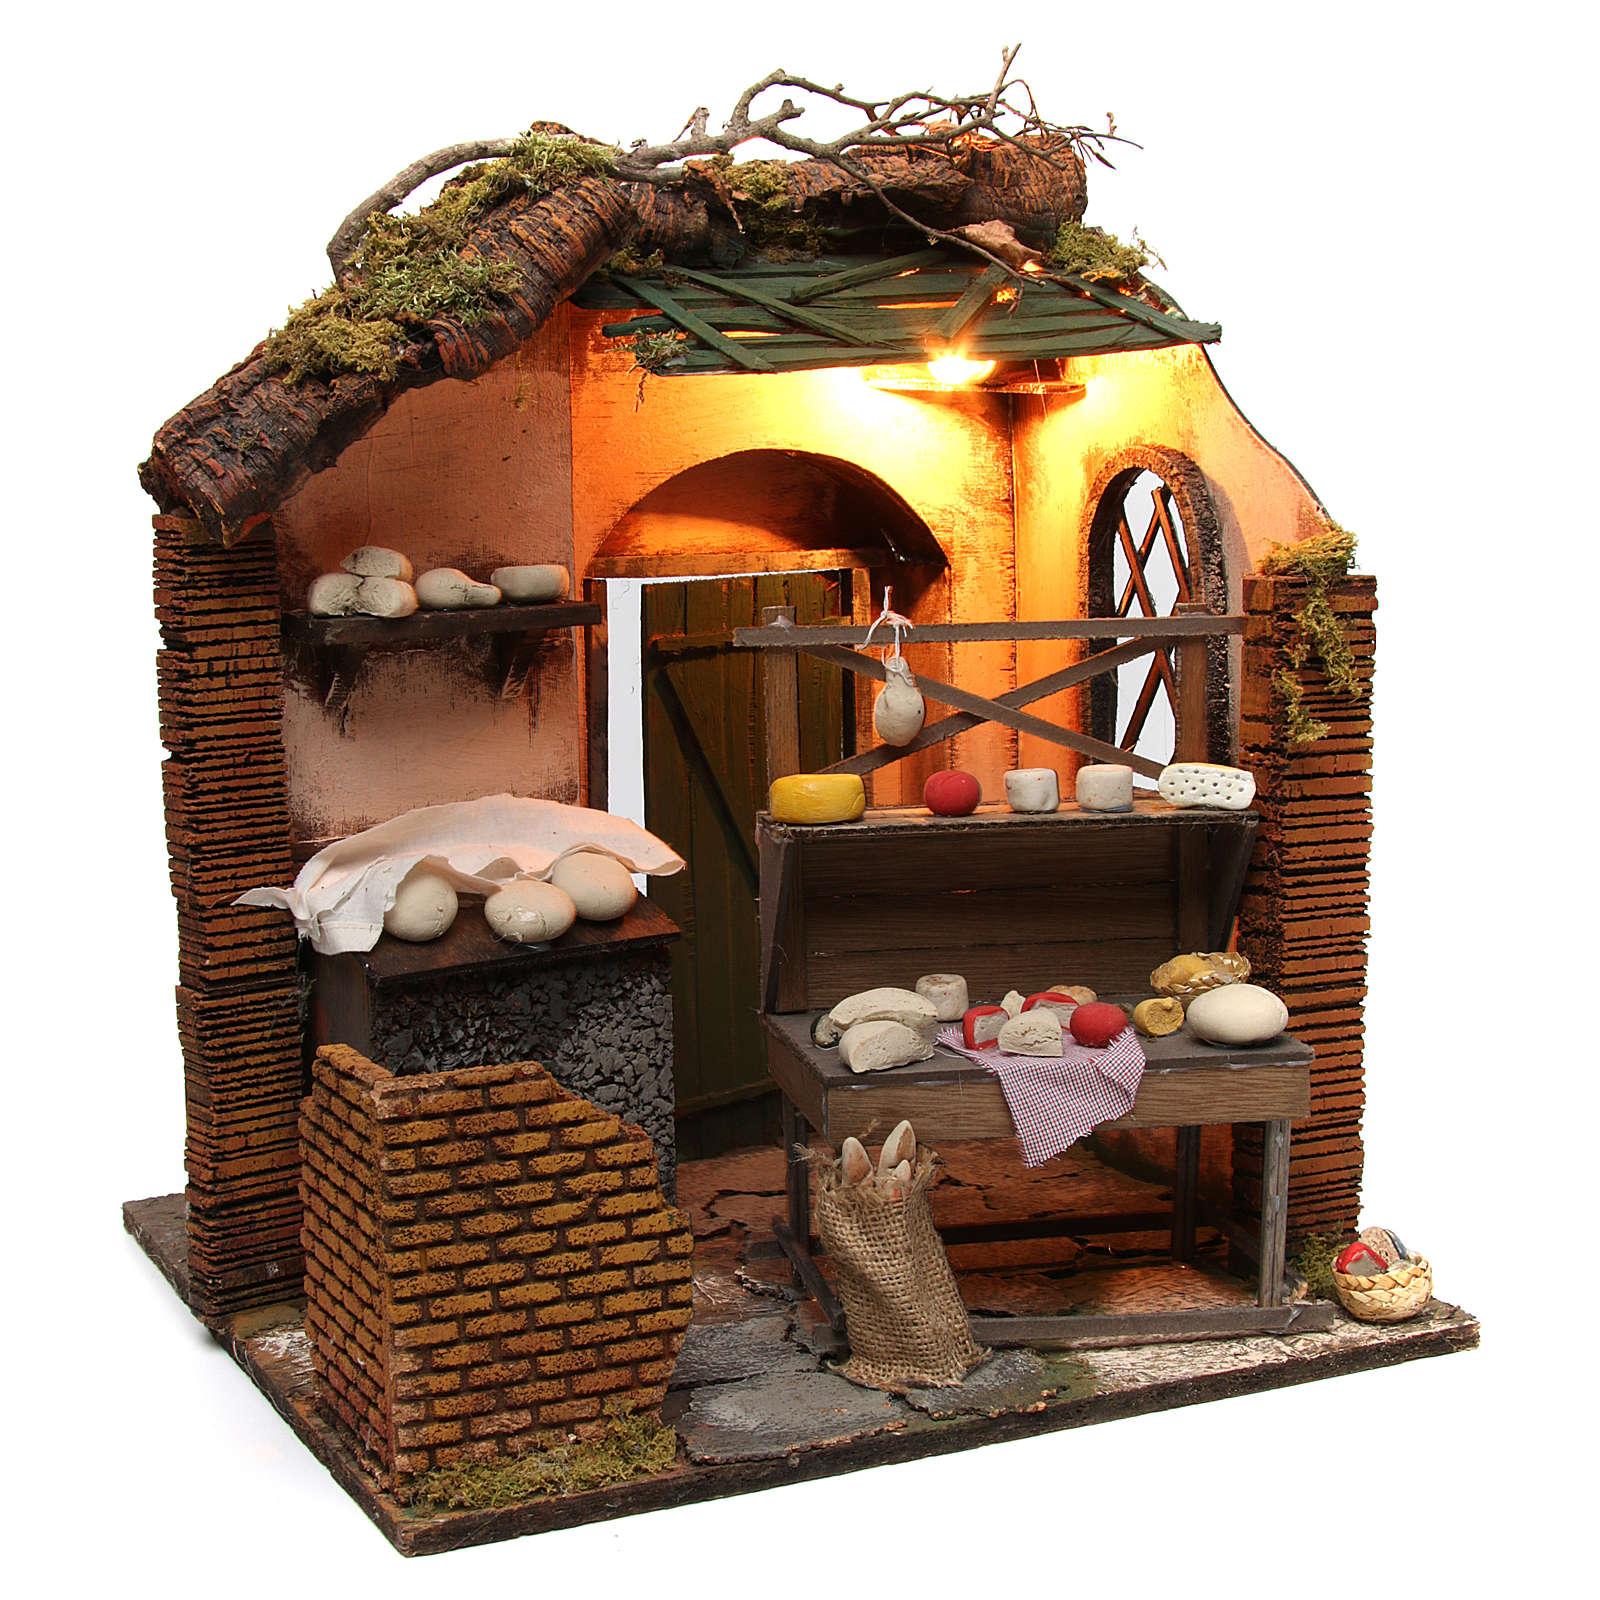 Creamery Shop Neapolitan Nativity 4